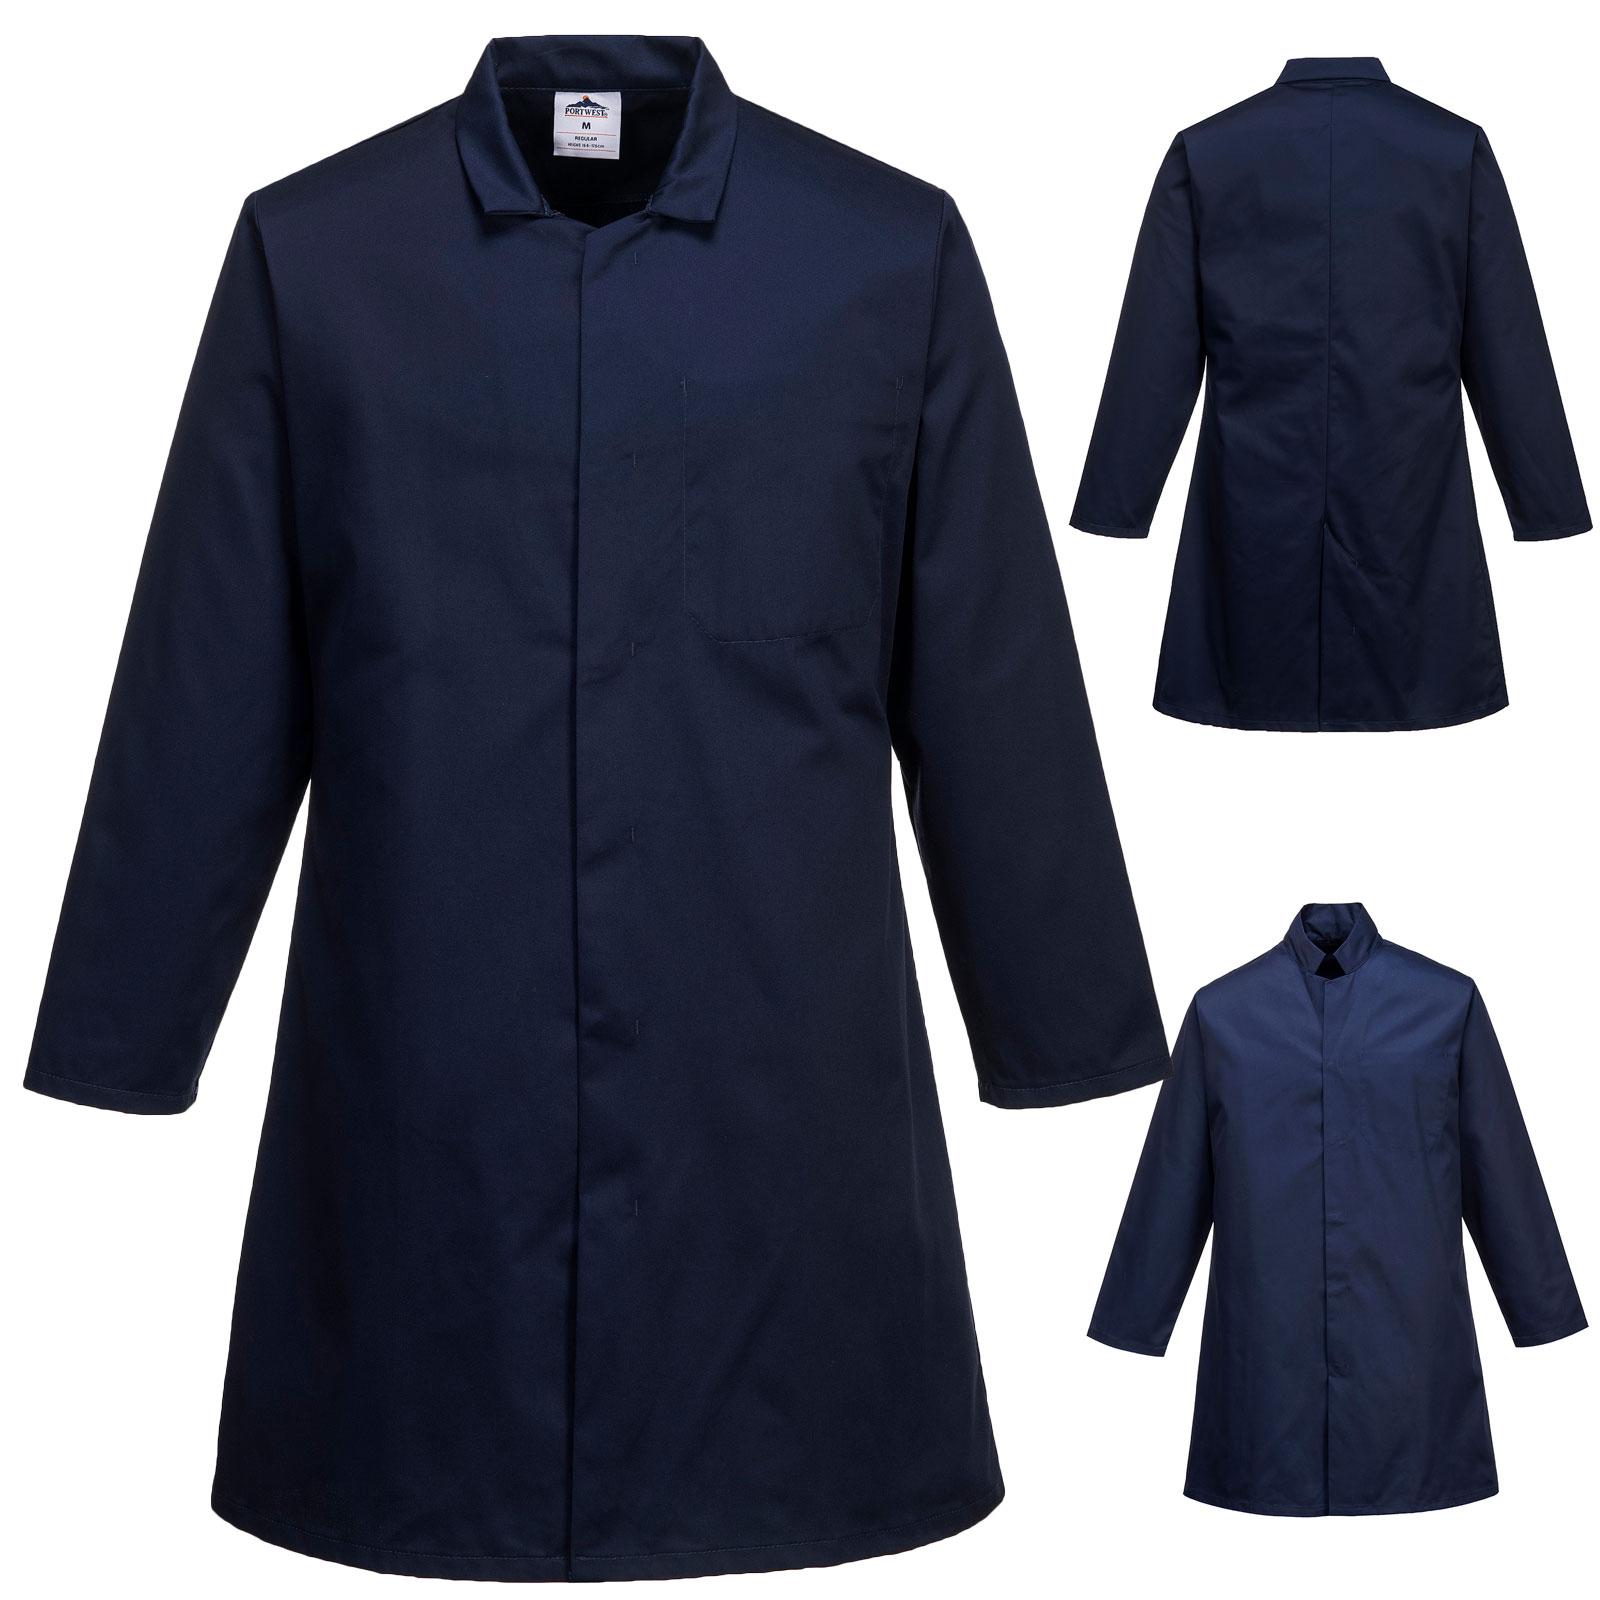 Mens Food Coat One Pocket - 2202_Navy